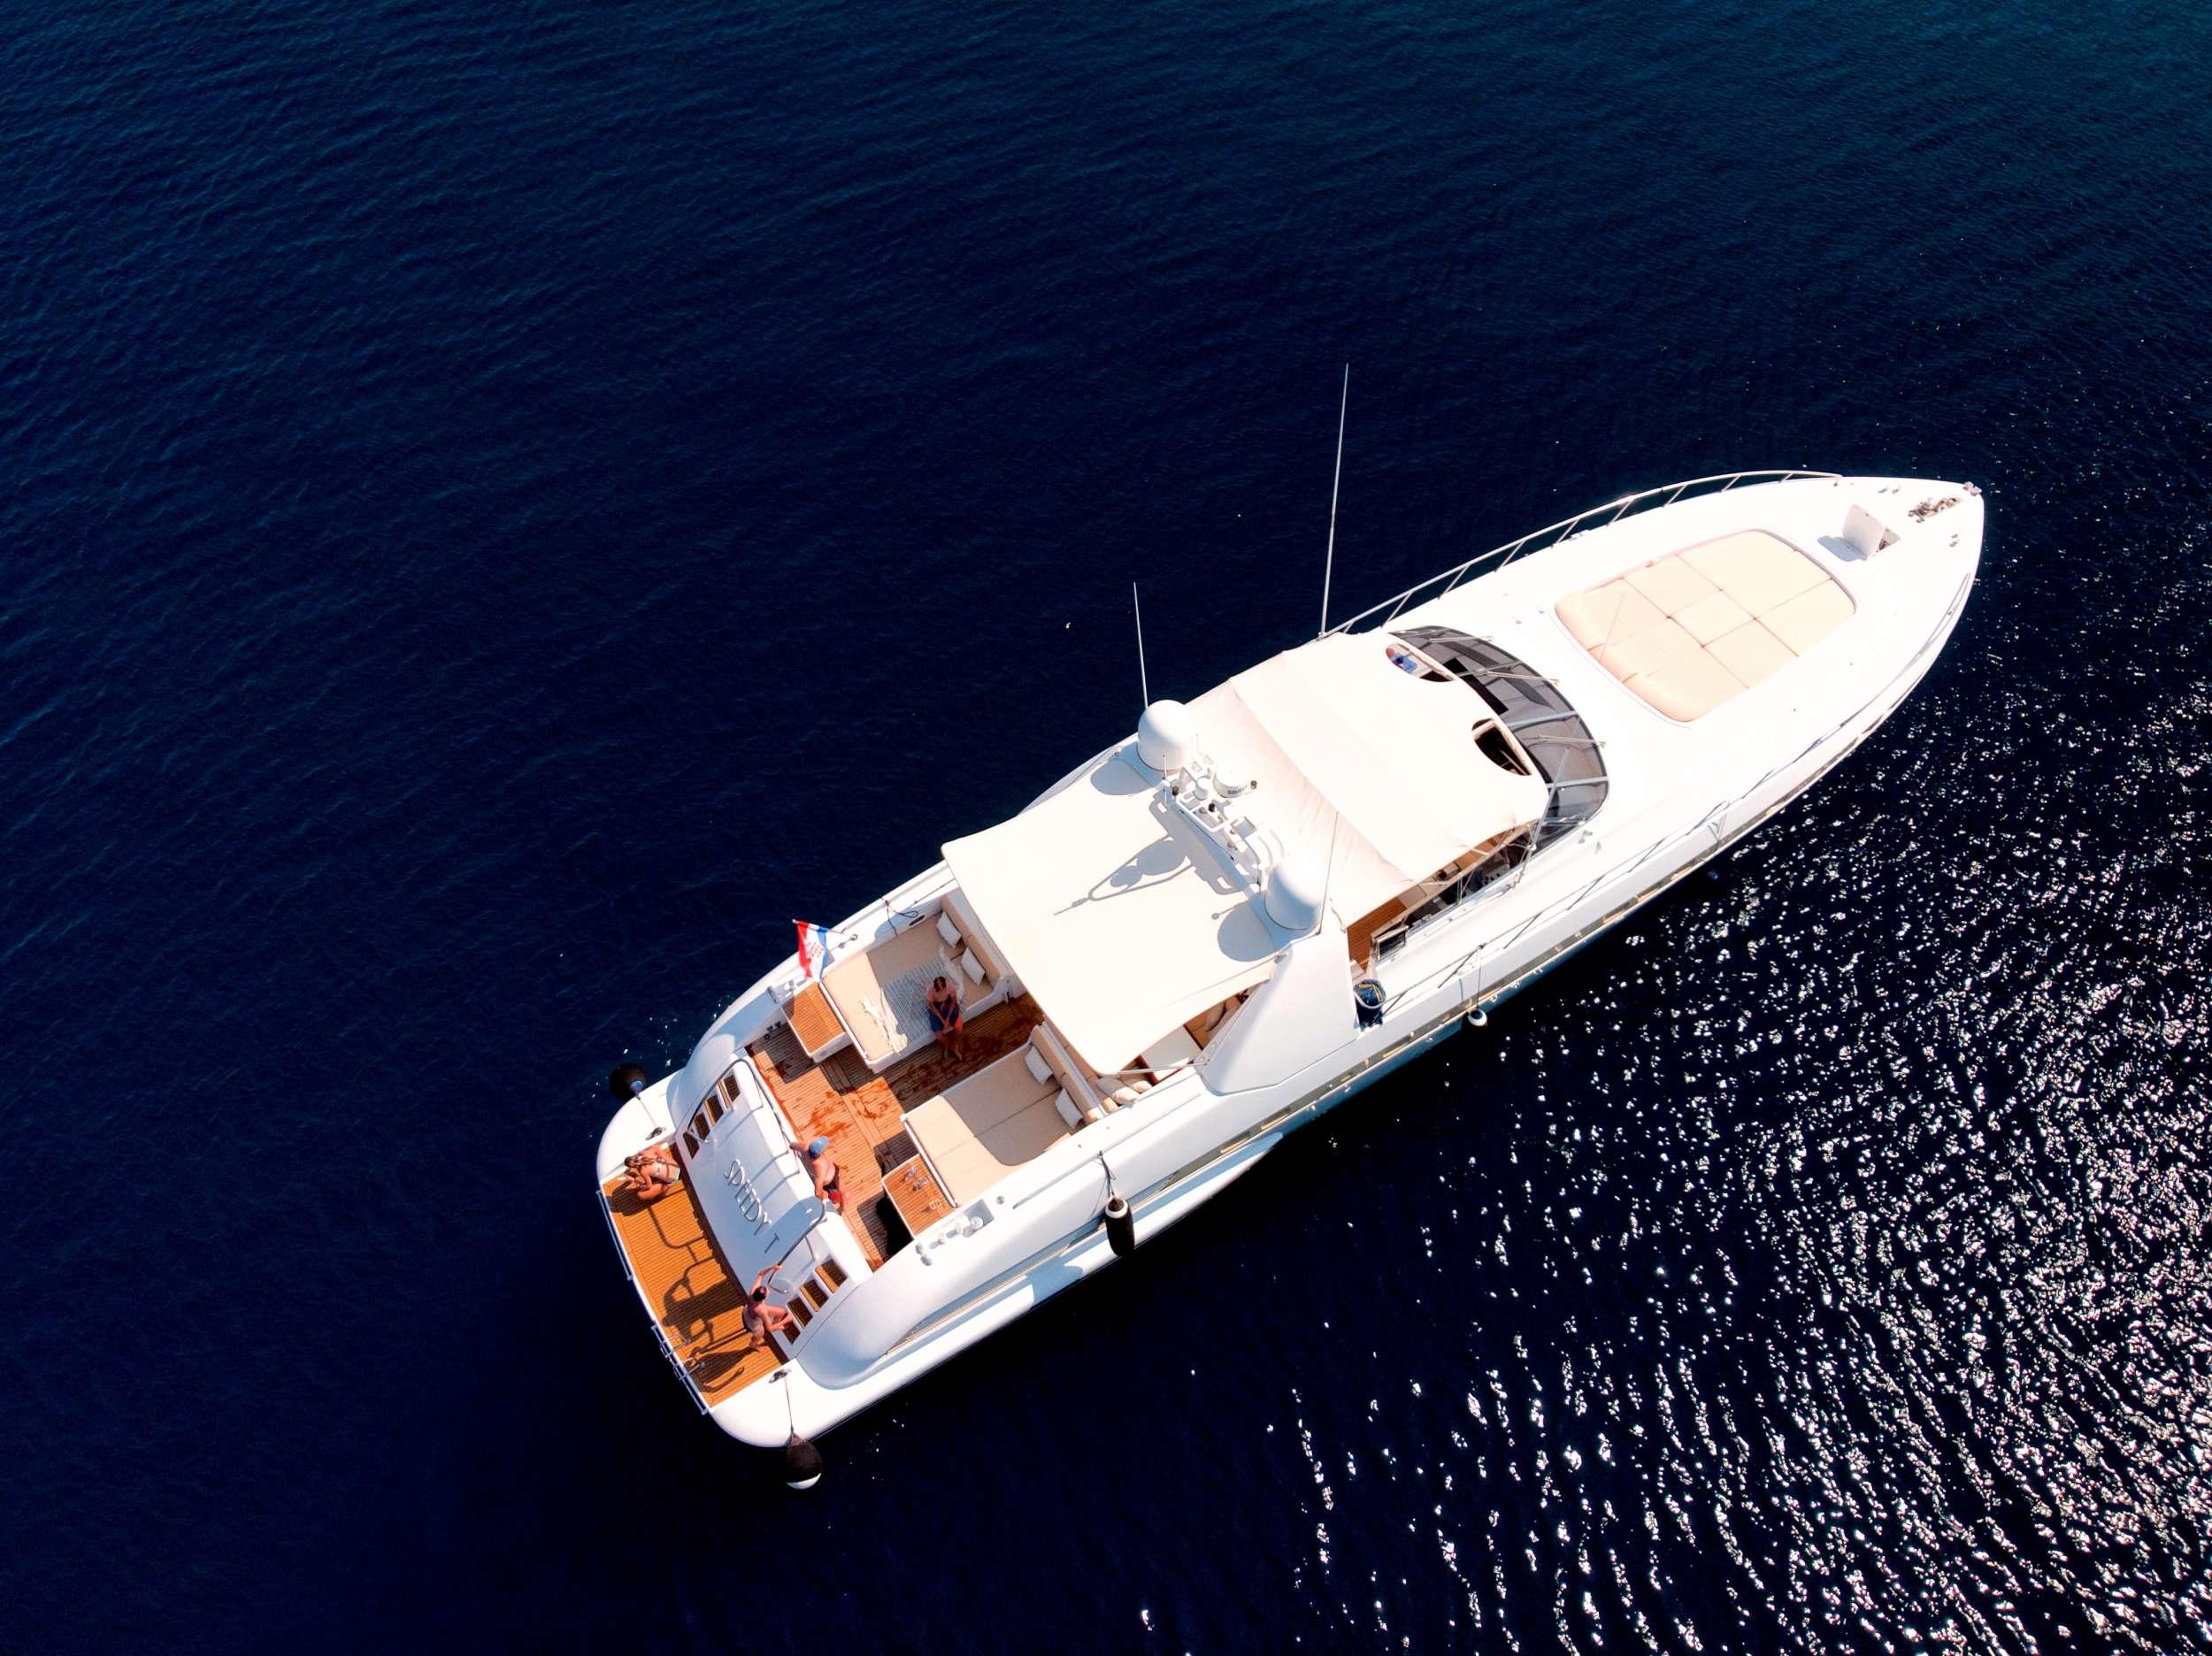 Main image of SPEEDY T yacht